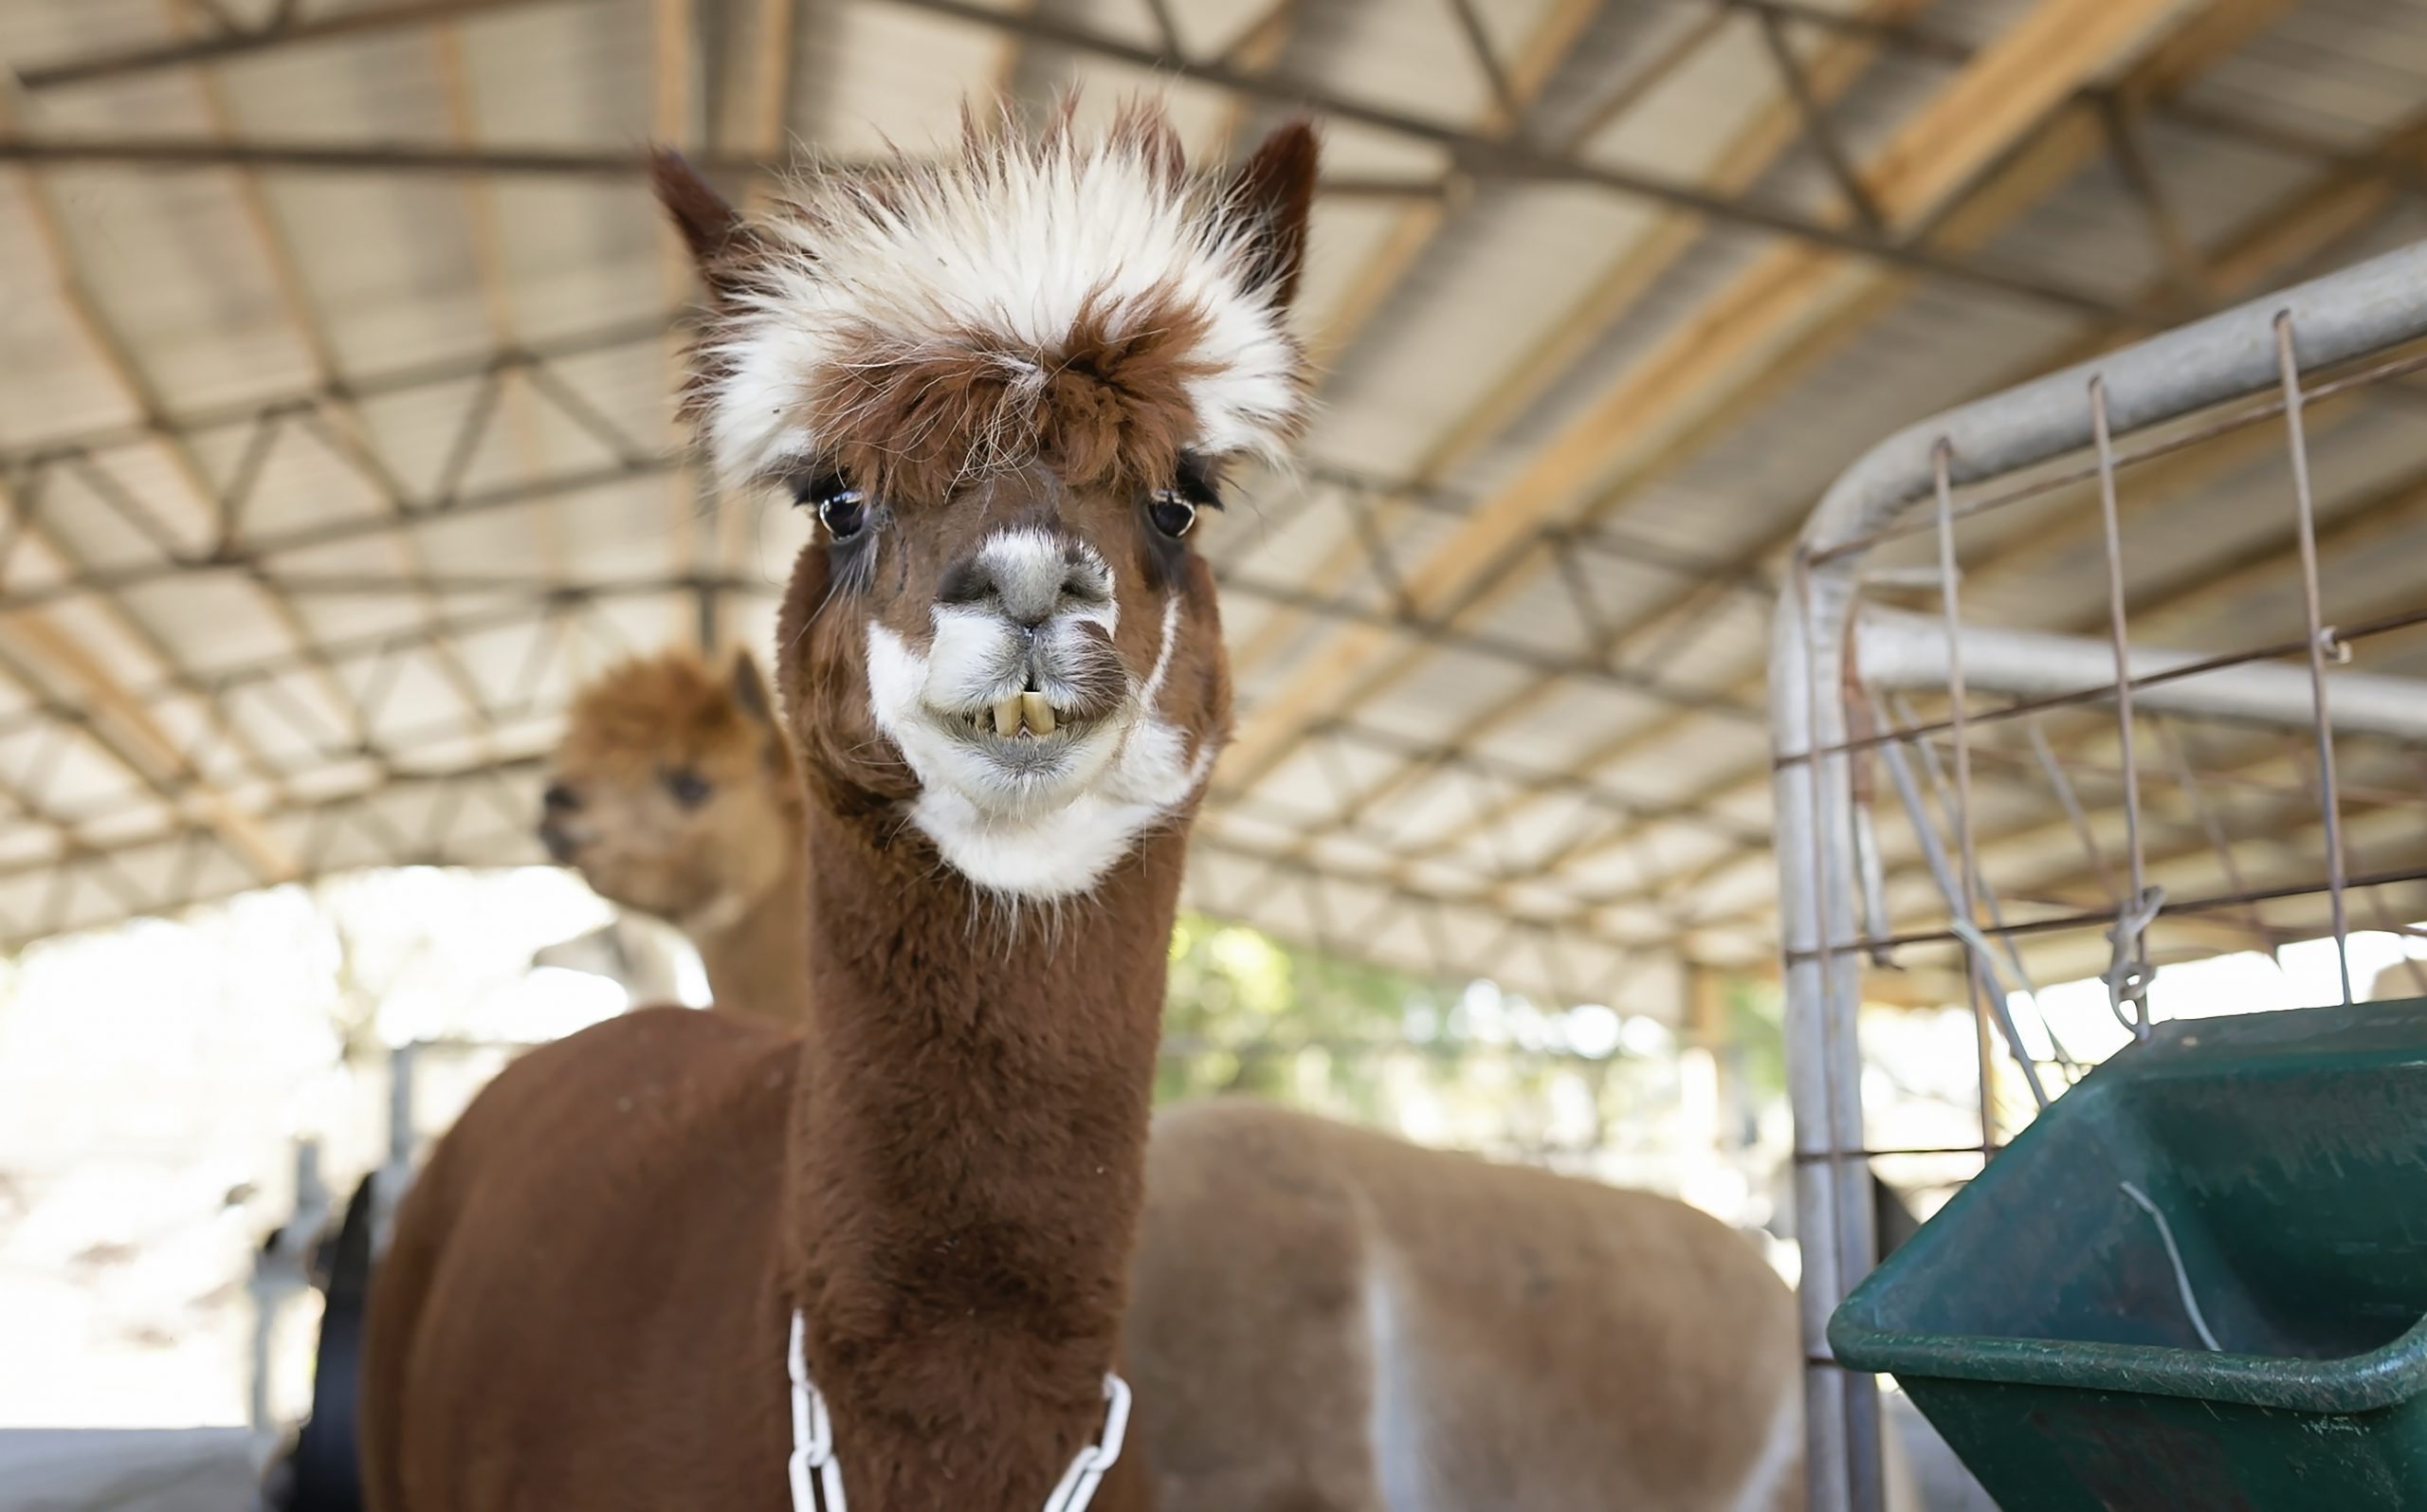 Dark brown Suri alpaca with white tuft of hair looking into camera